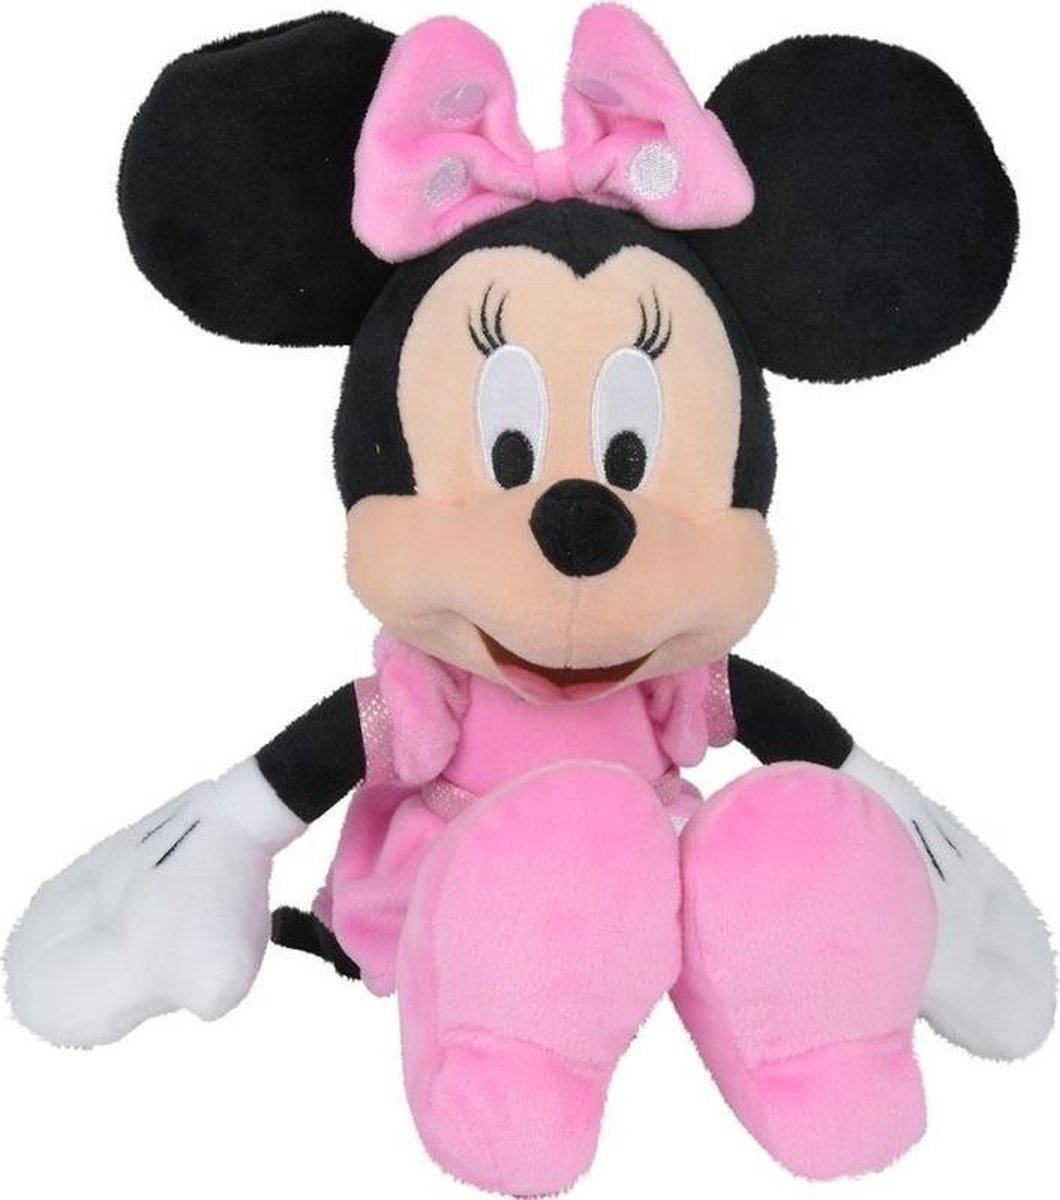 Disney Pluche Minnie Mouse 90th Anniversary 22 cm